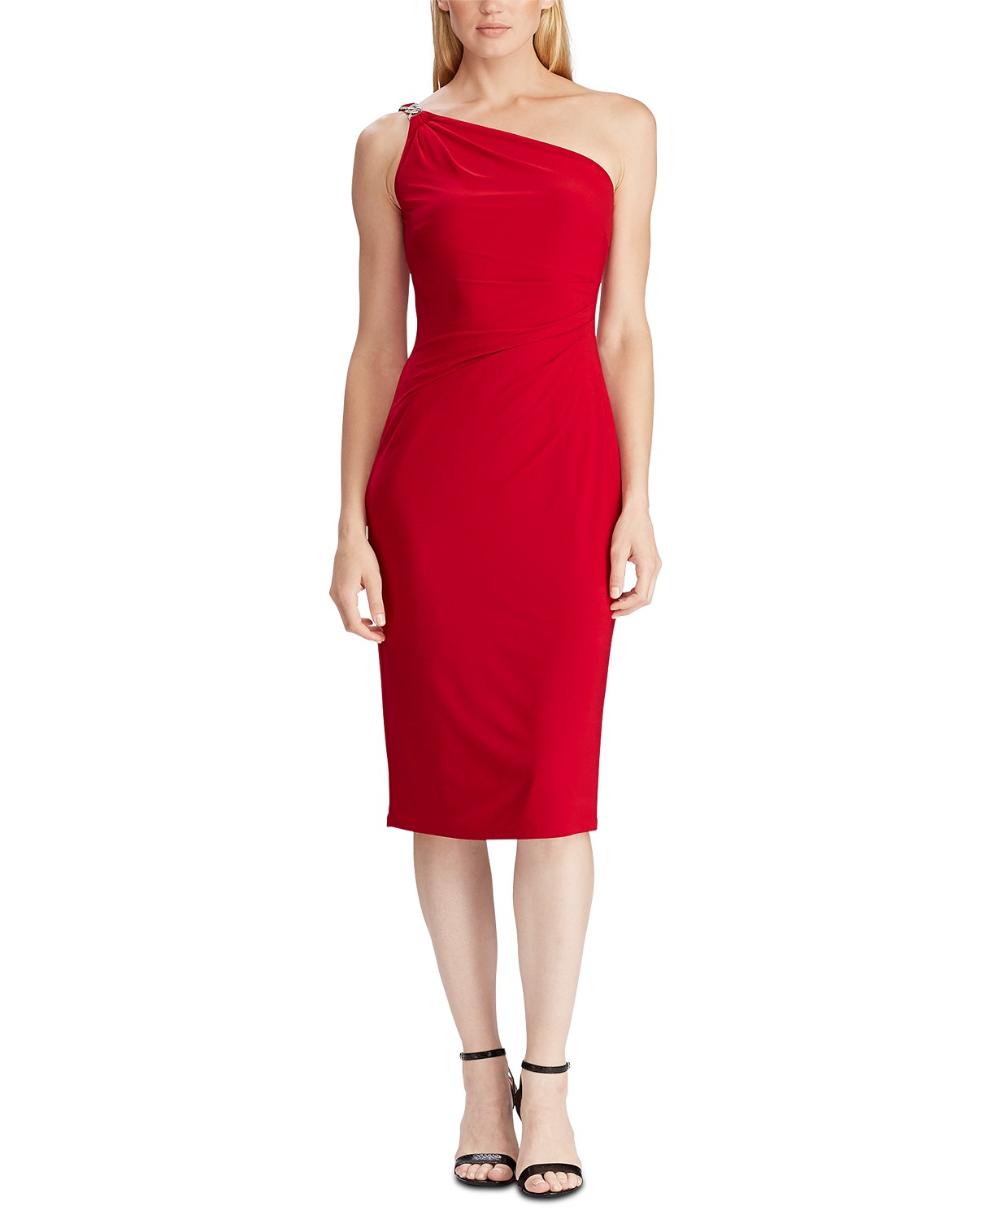 Lauren Ralph Lauren One Shoulder Cocktail Dress Created For Macy S Reviews Dresses Women Red Cocktail Dress One Shoulder Cocktail Dress Cocktail Dress [ 1219 x 1000 Pixel ]